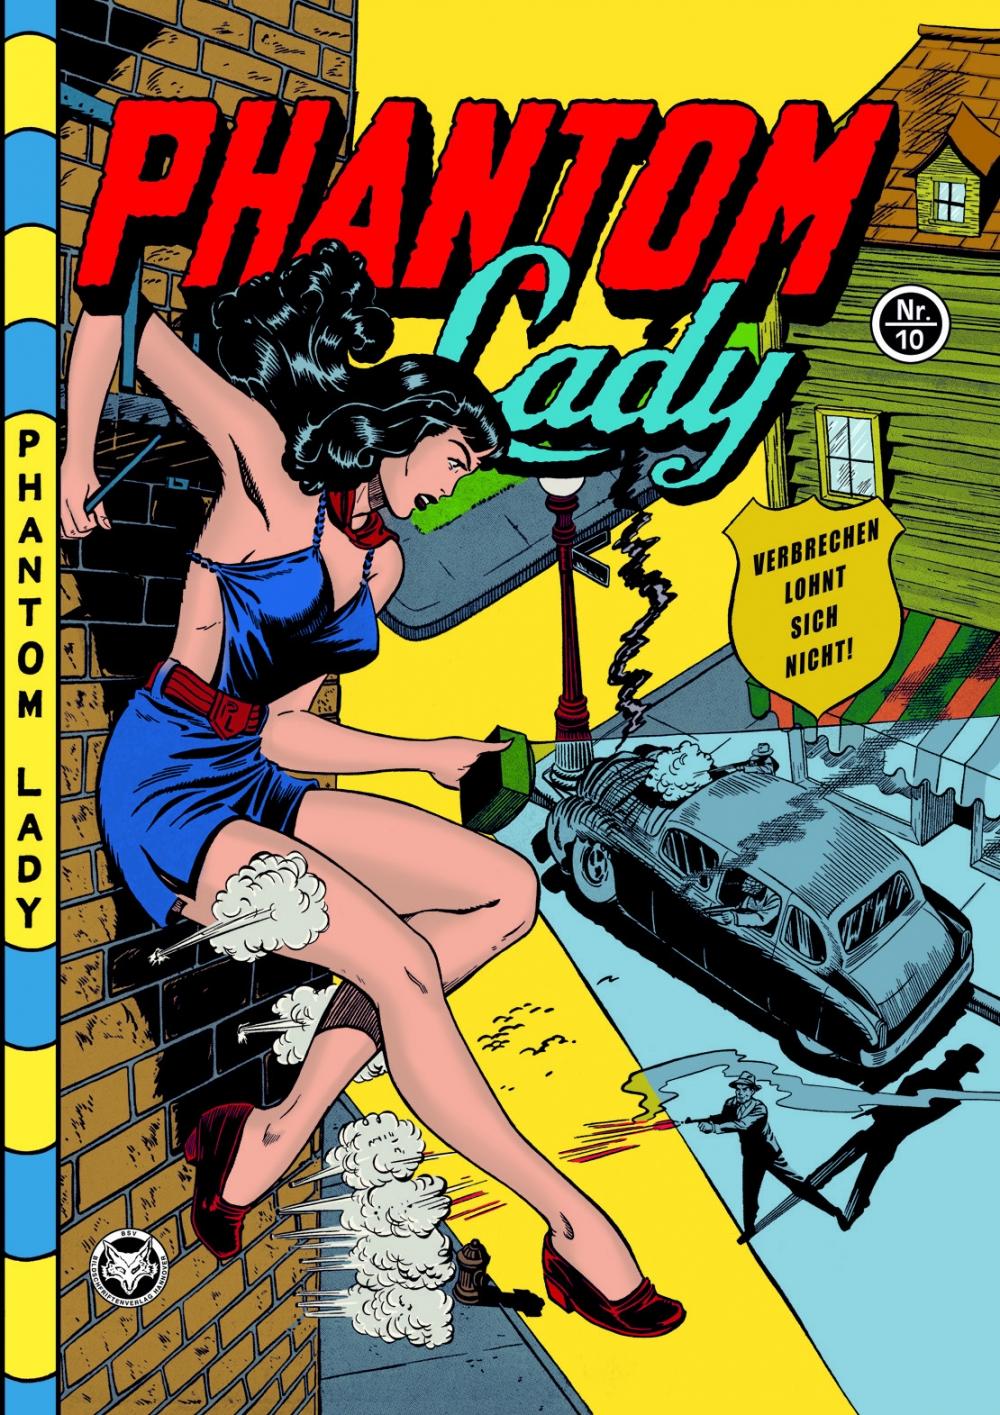 bsv Hannover Phantom Lady 2